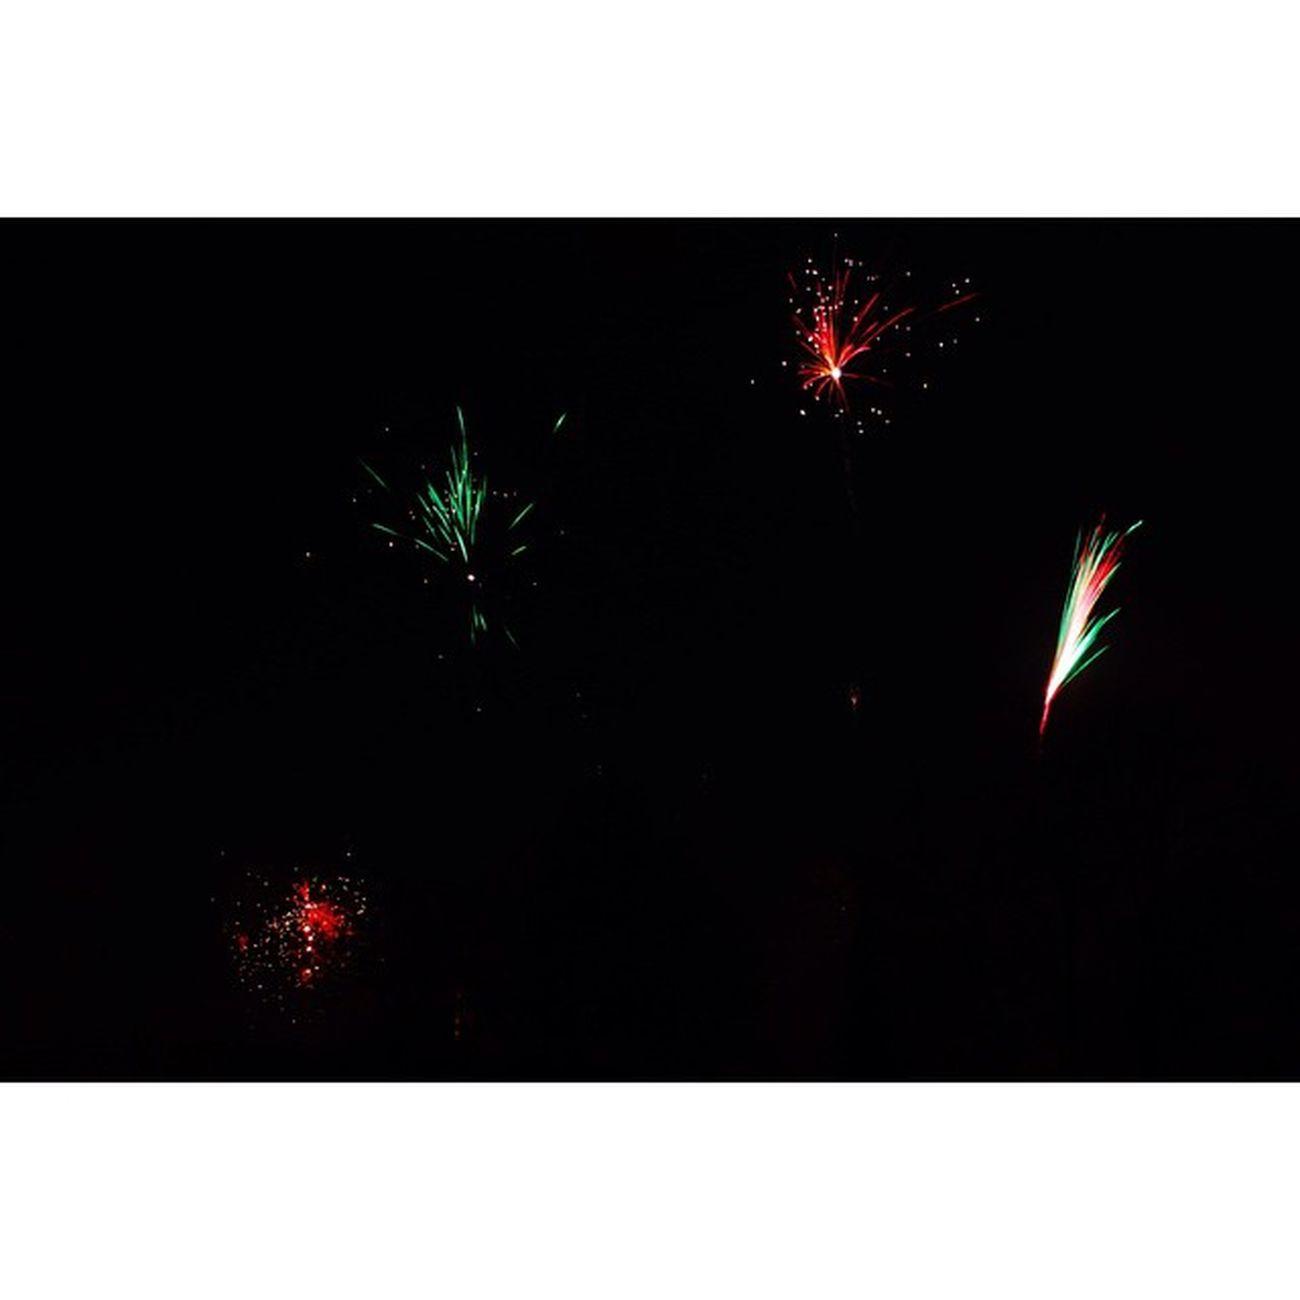 Silvester NewYearsEv Camera: Canon EOS 700D Lens: Canon 18-55mm 18mm f/11 15sec ISO 100 Firework Feuerwerk NewYear NeuJahr Canon CanonEOS700D ig_deutschland